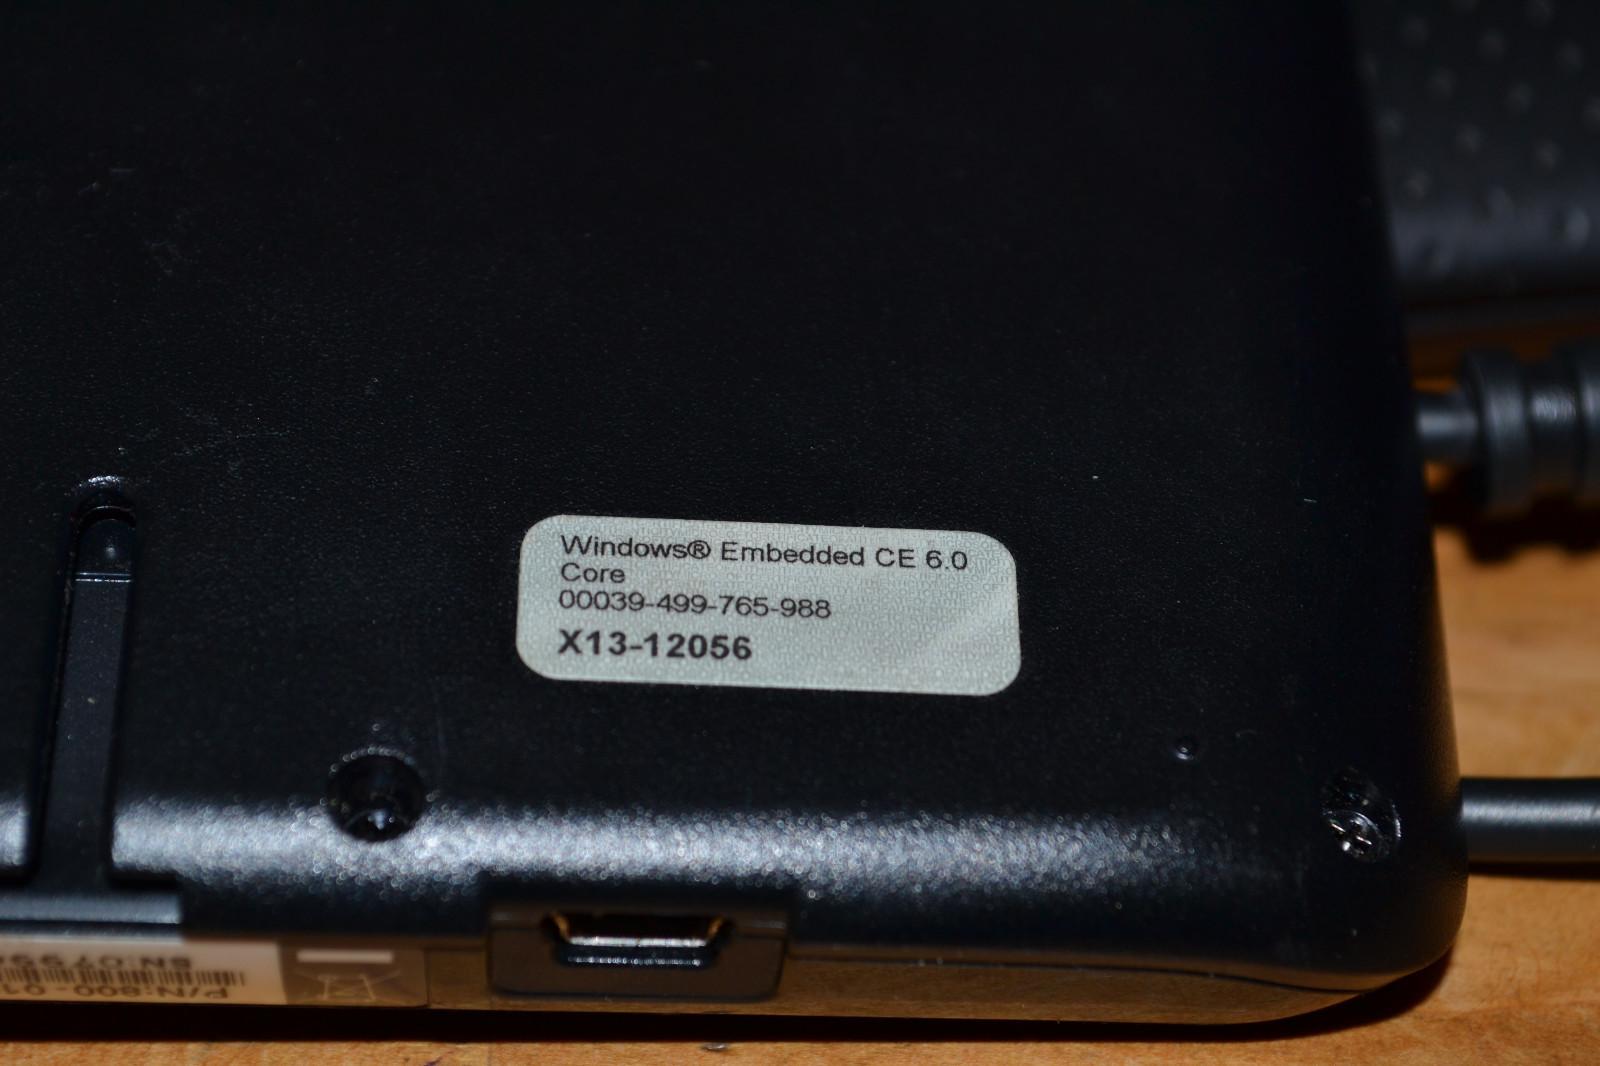 Magellan Roadmate X13-12056 GPS Unit Windows Embedded  CE 6.0 Core